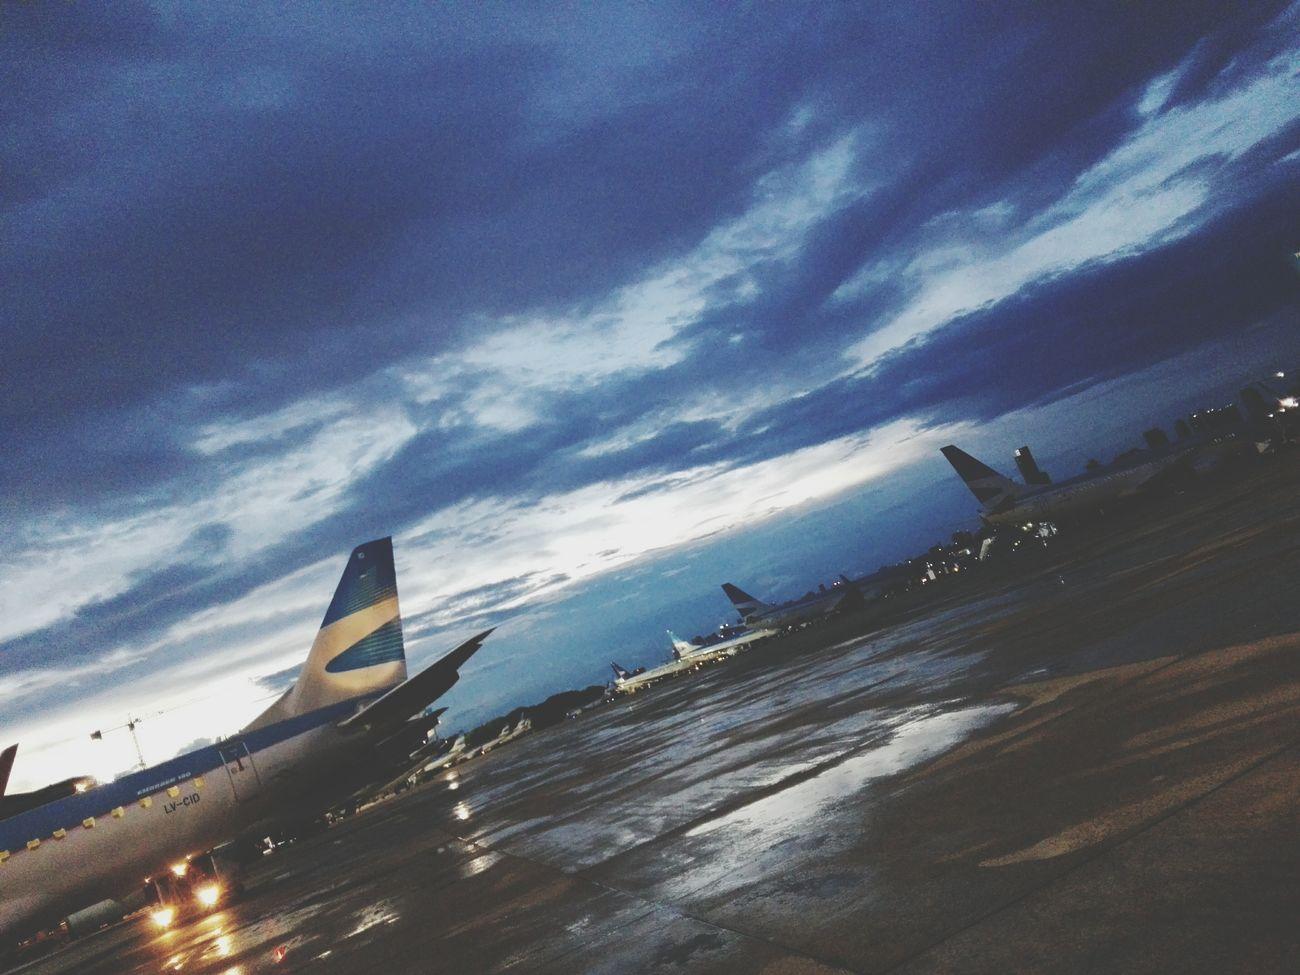 AEP Aeroparque Aerolineas Argentinas Boeing 737-800 Skyteam Letsgo LVFVN First Eyeem Photo Aircraft AirPlane ✈ Airport